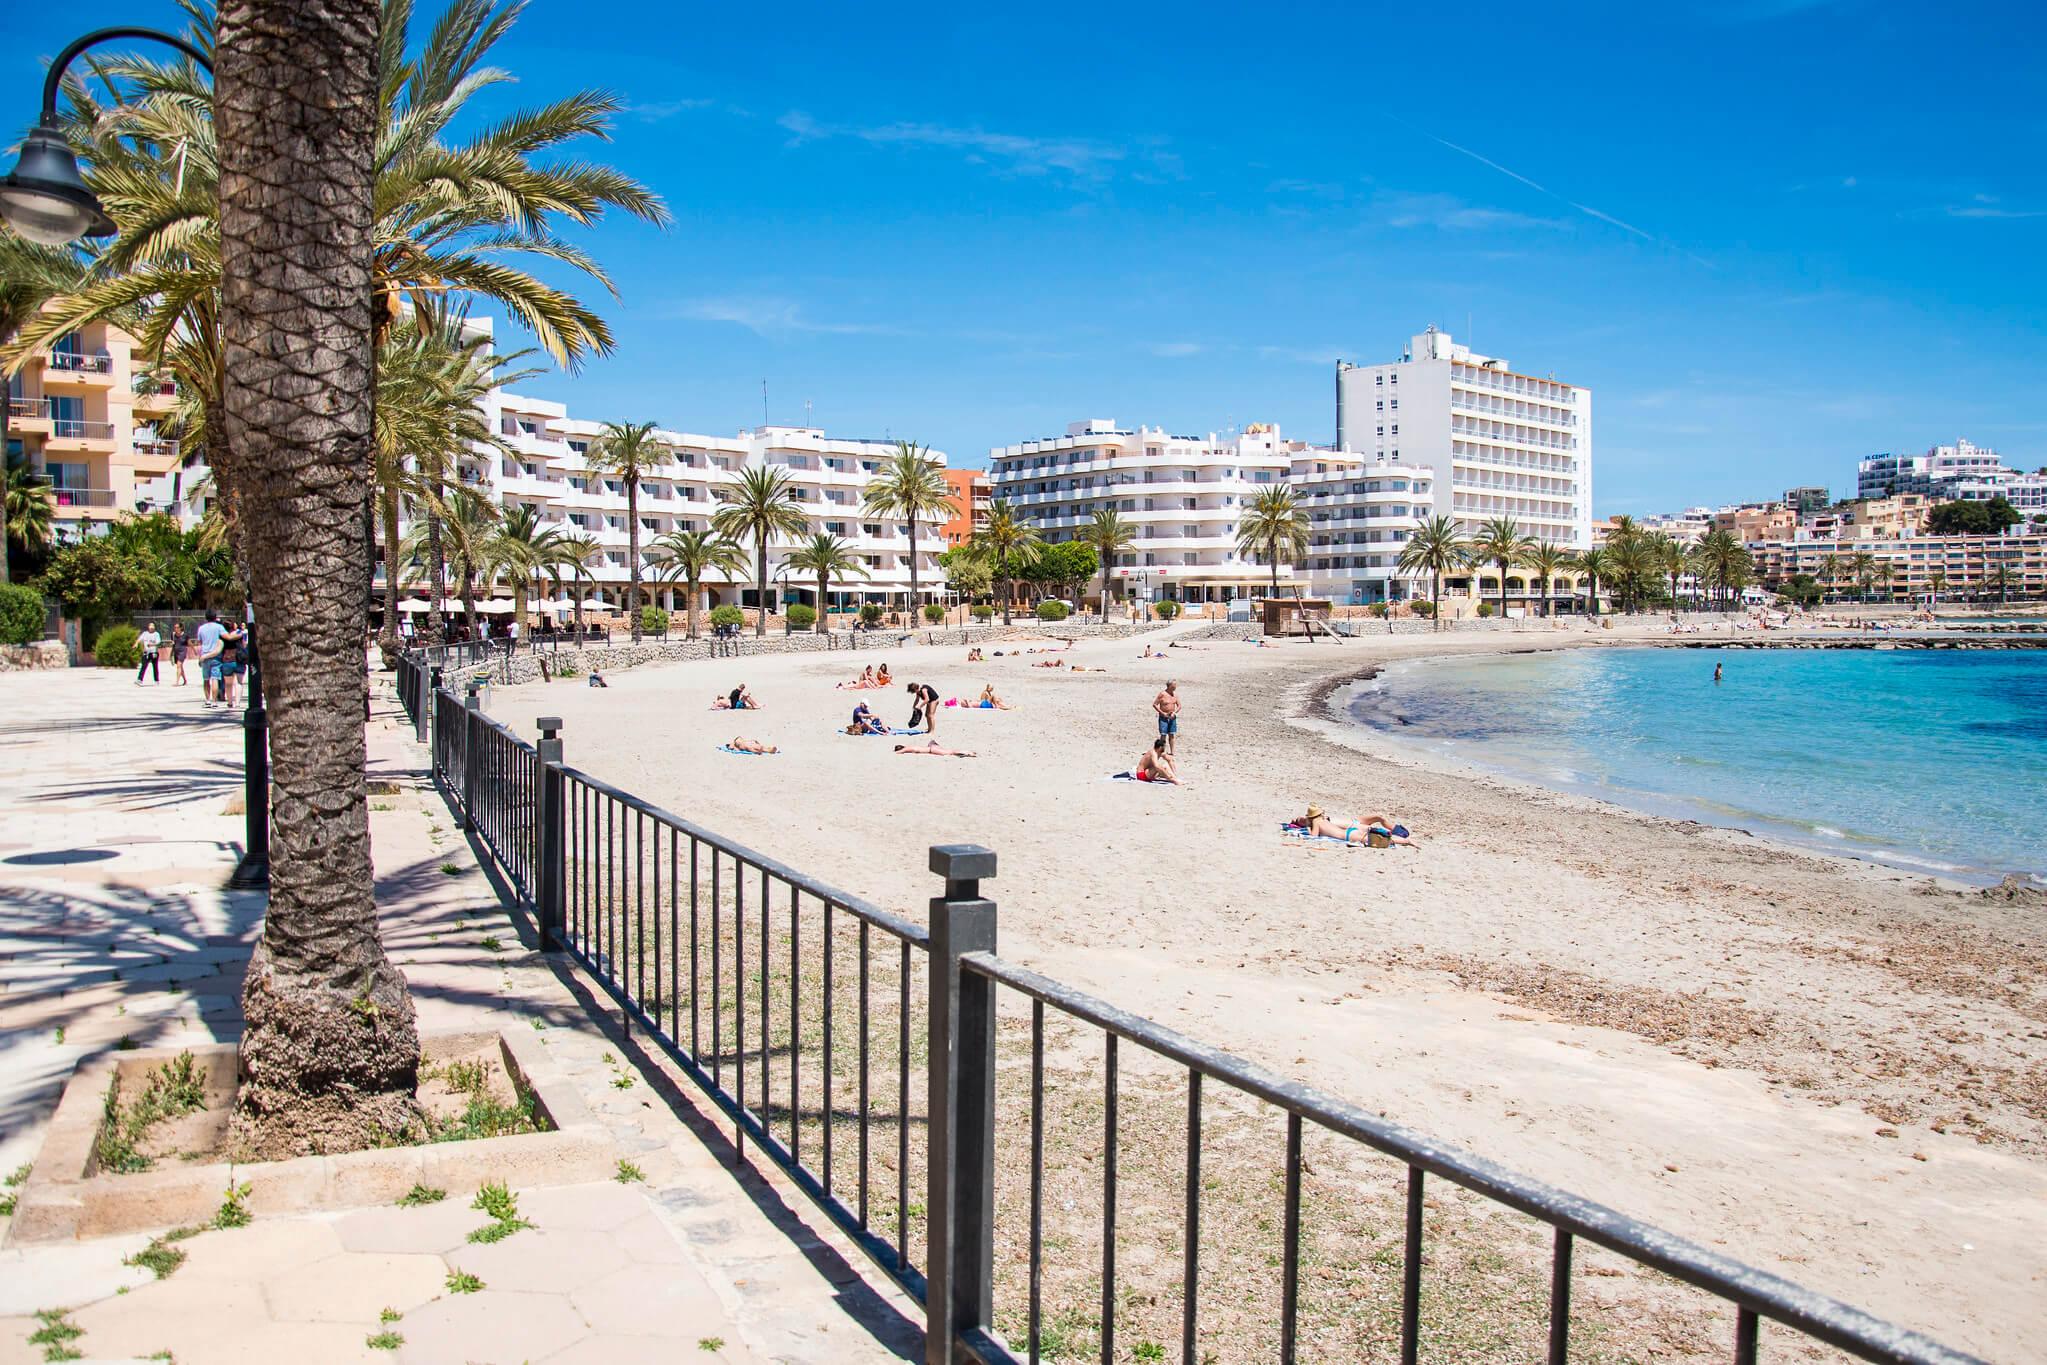 https://www.white-ibiza.com/wp-content/uploads/2020/03/ibiza-beaches-figueretas-02.jpg